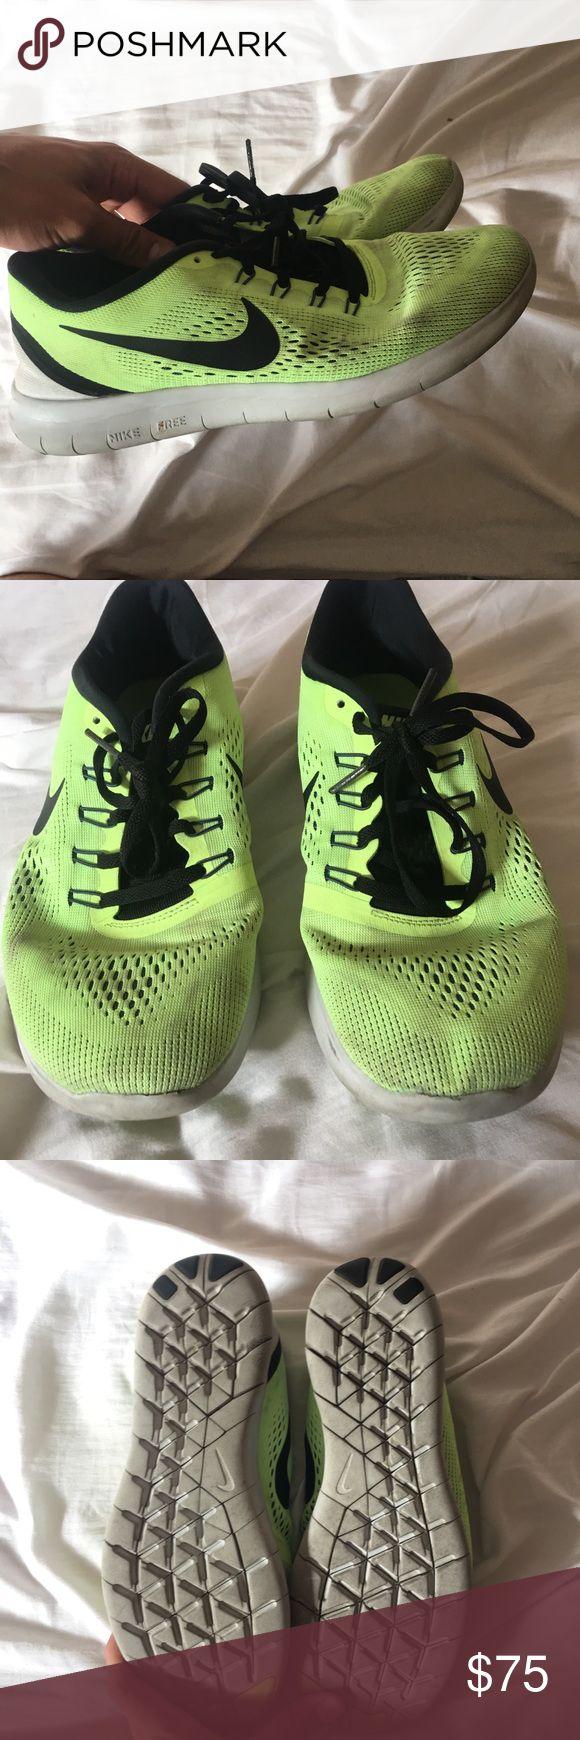 Nike Free runner Used no box. Nike Shoes Sneakers